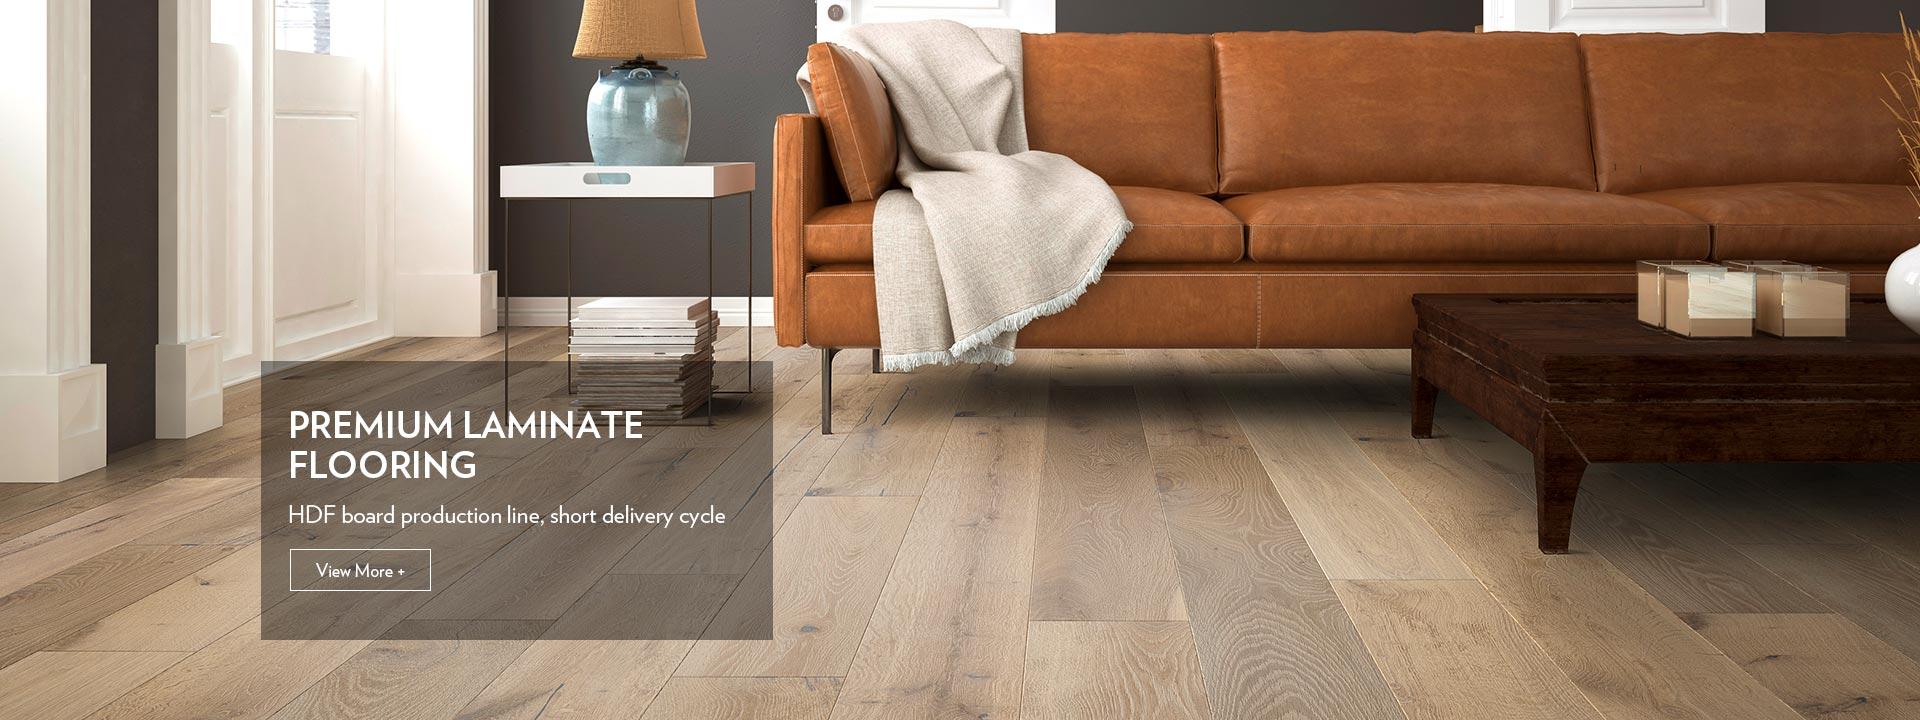 Laminte Flooring